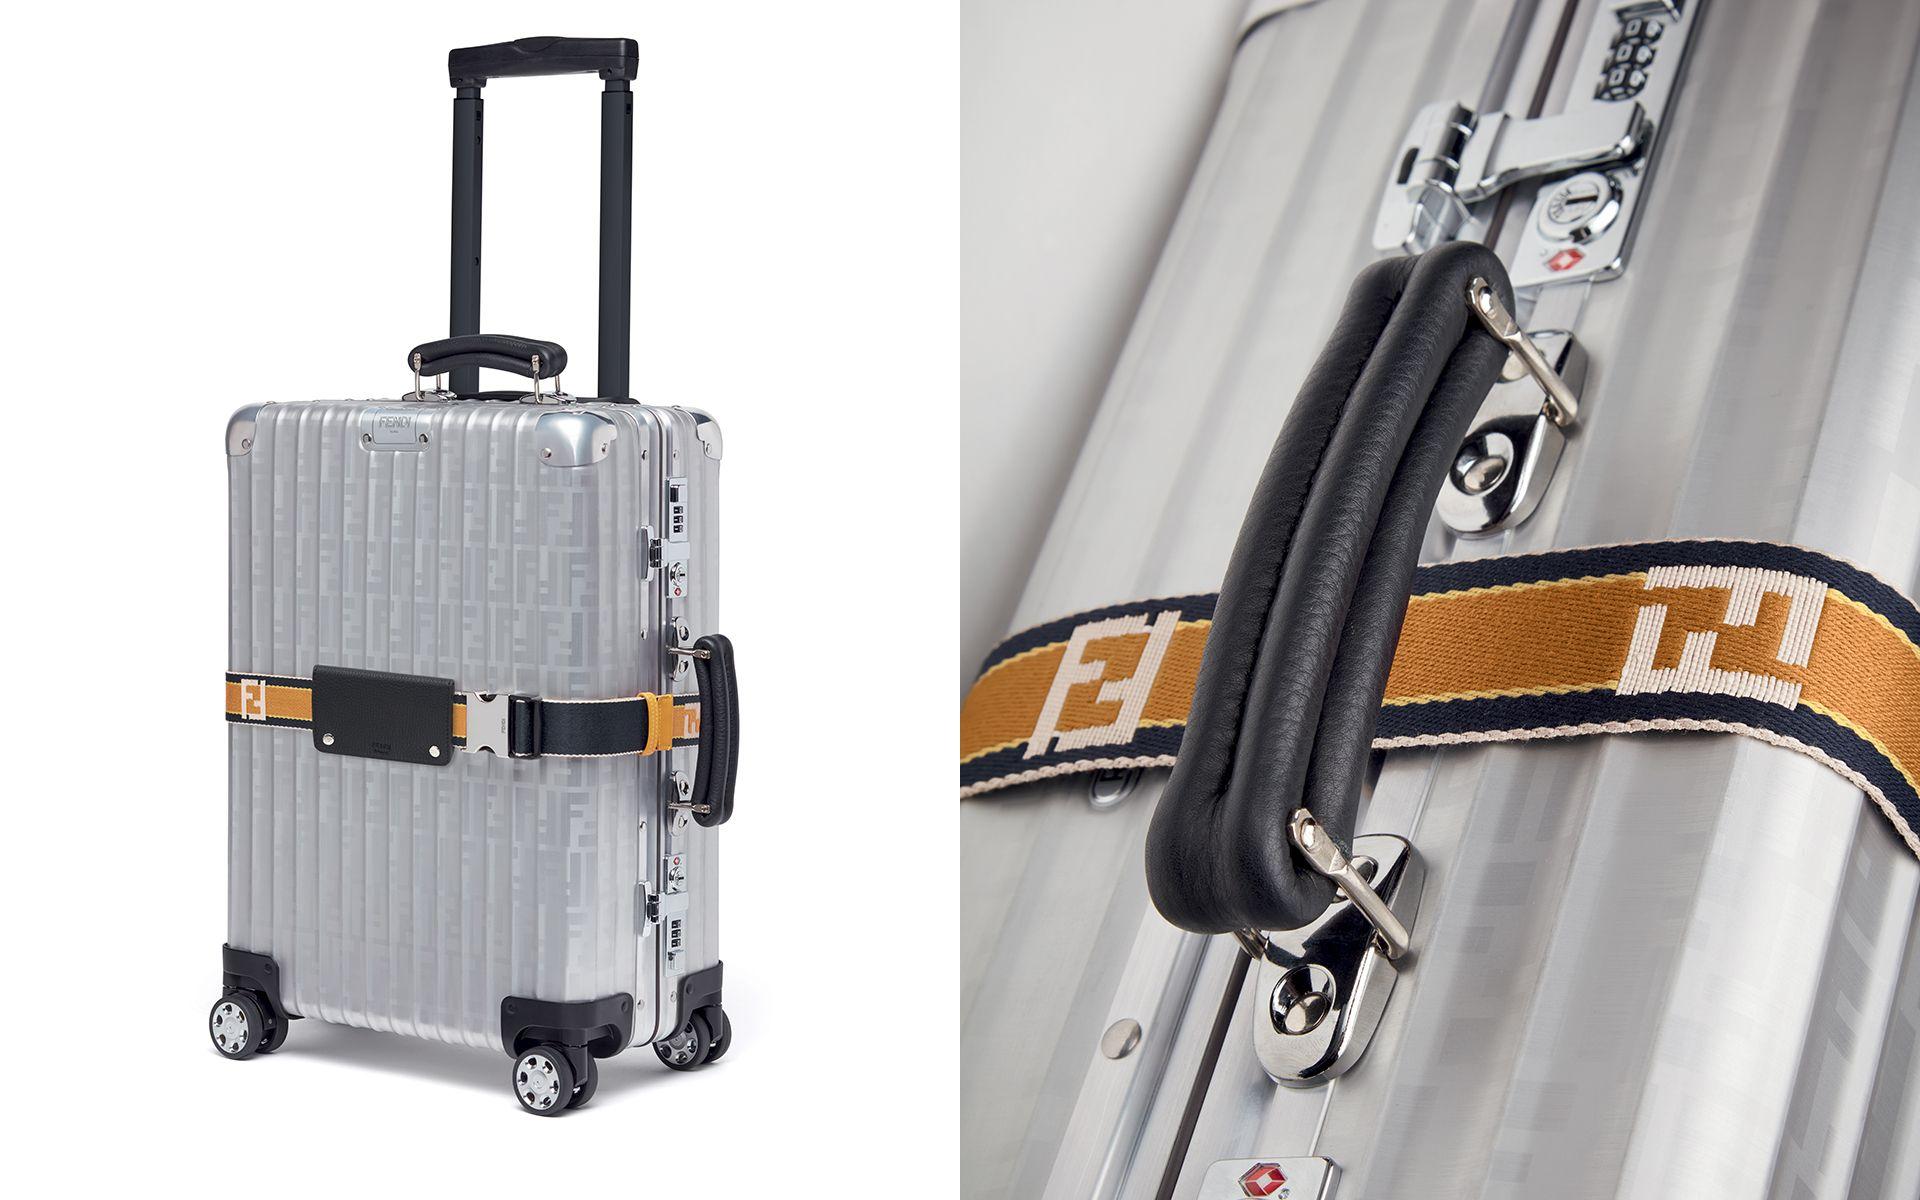 606afd21a4e0 Fendi x Rimowa Presents A Case For The Luxury Jet-Set